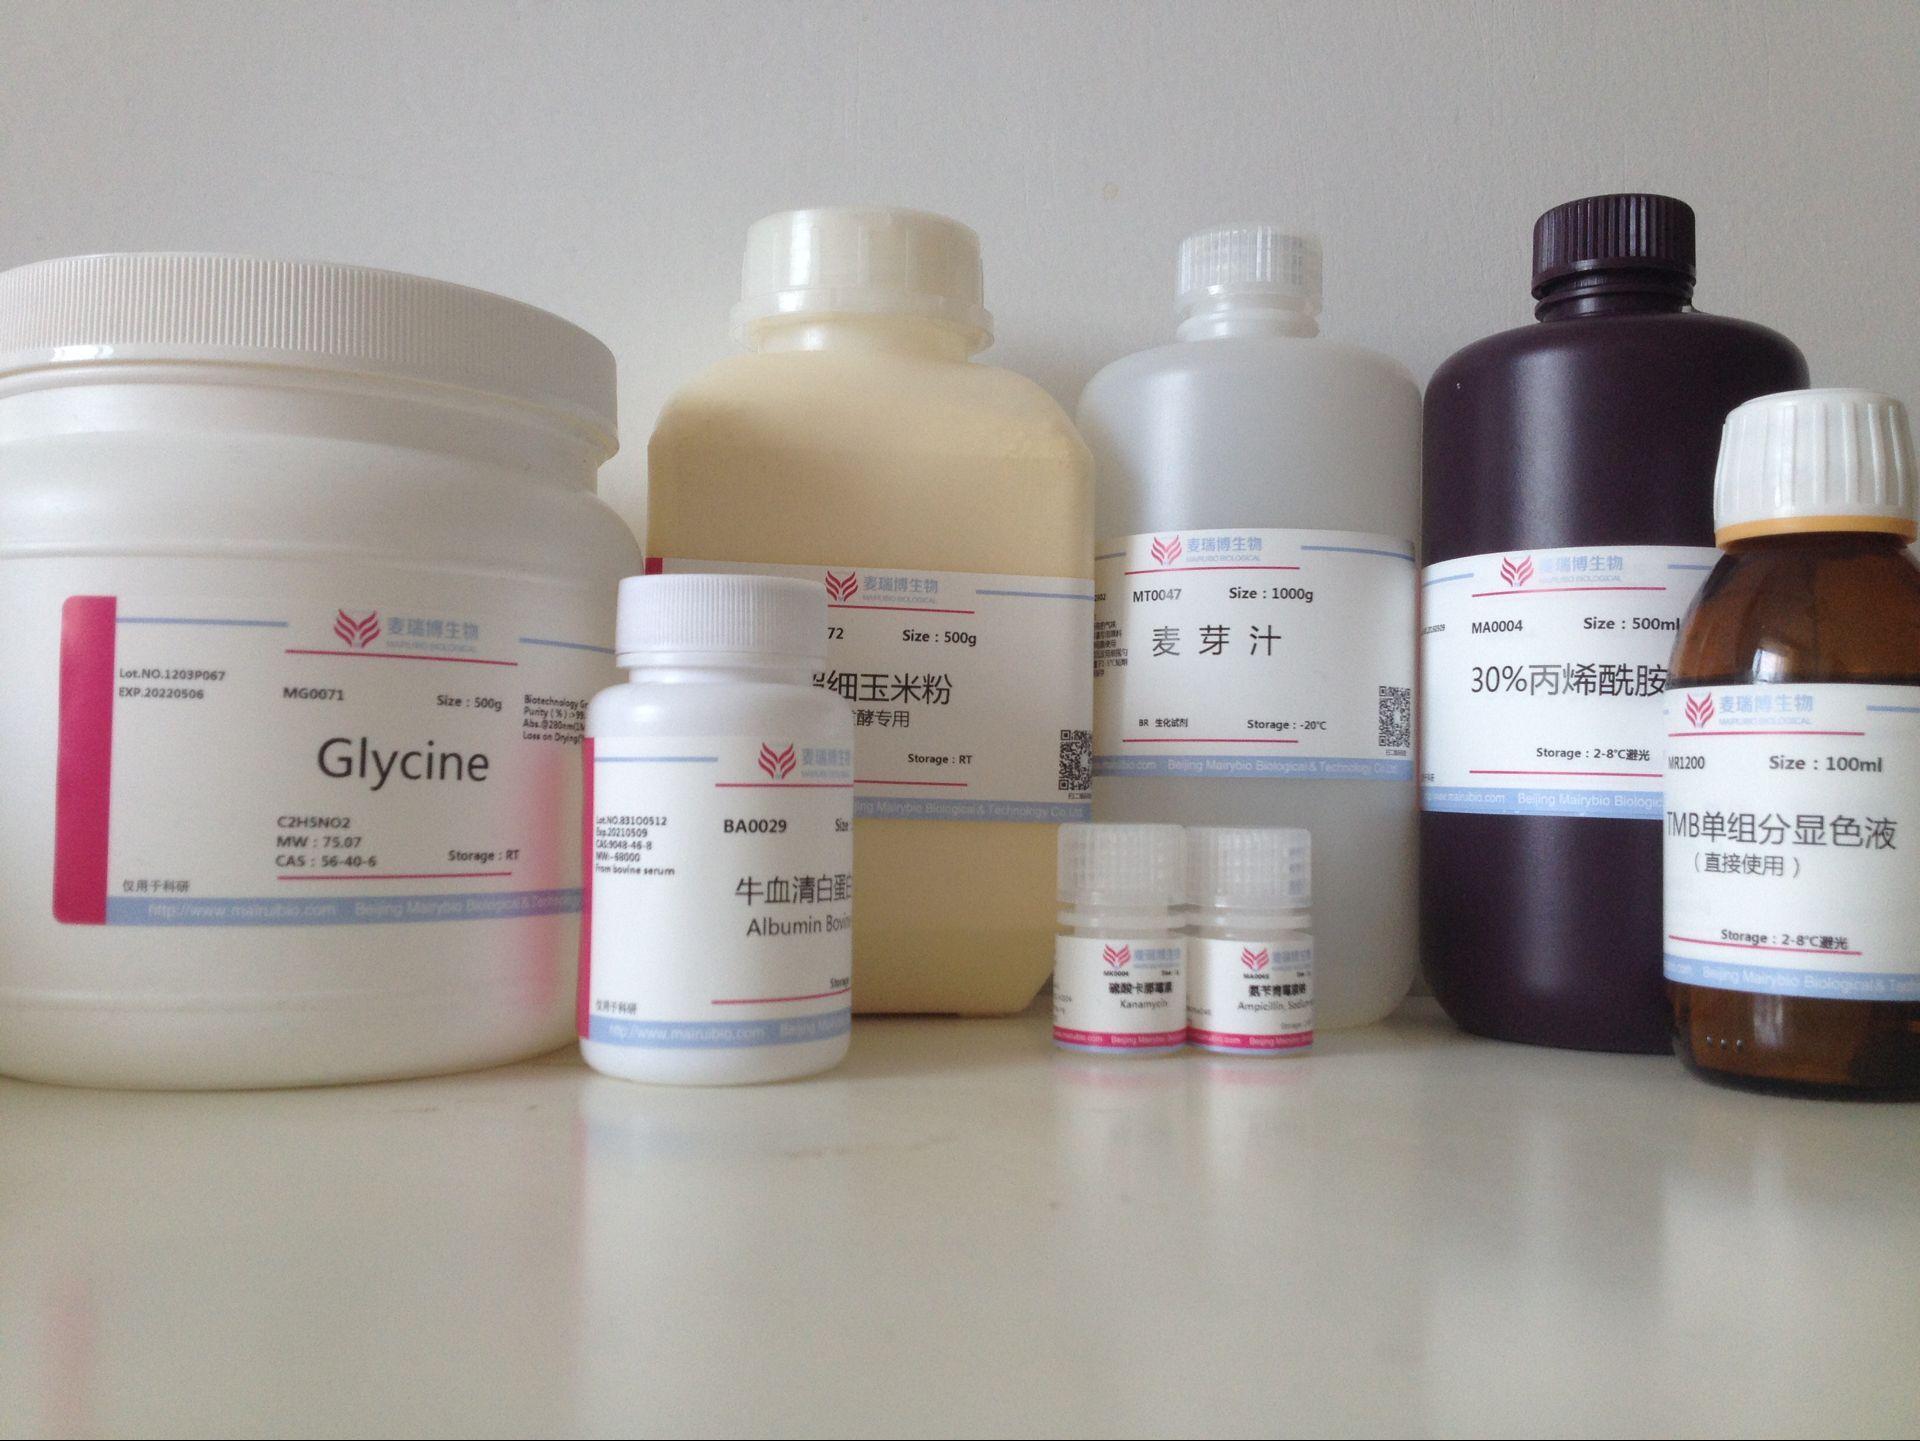 99-10-5\99-10-5\99-10-5\3,5-Dihydroxybenzoic acid